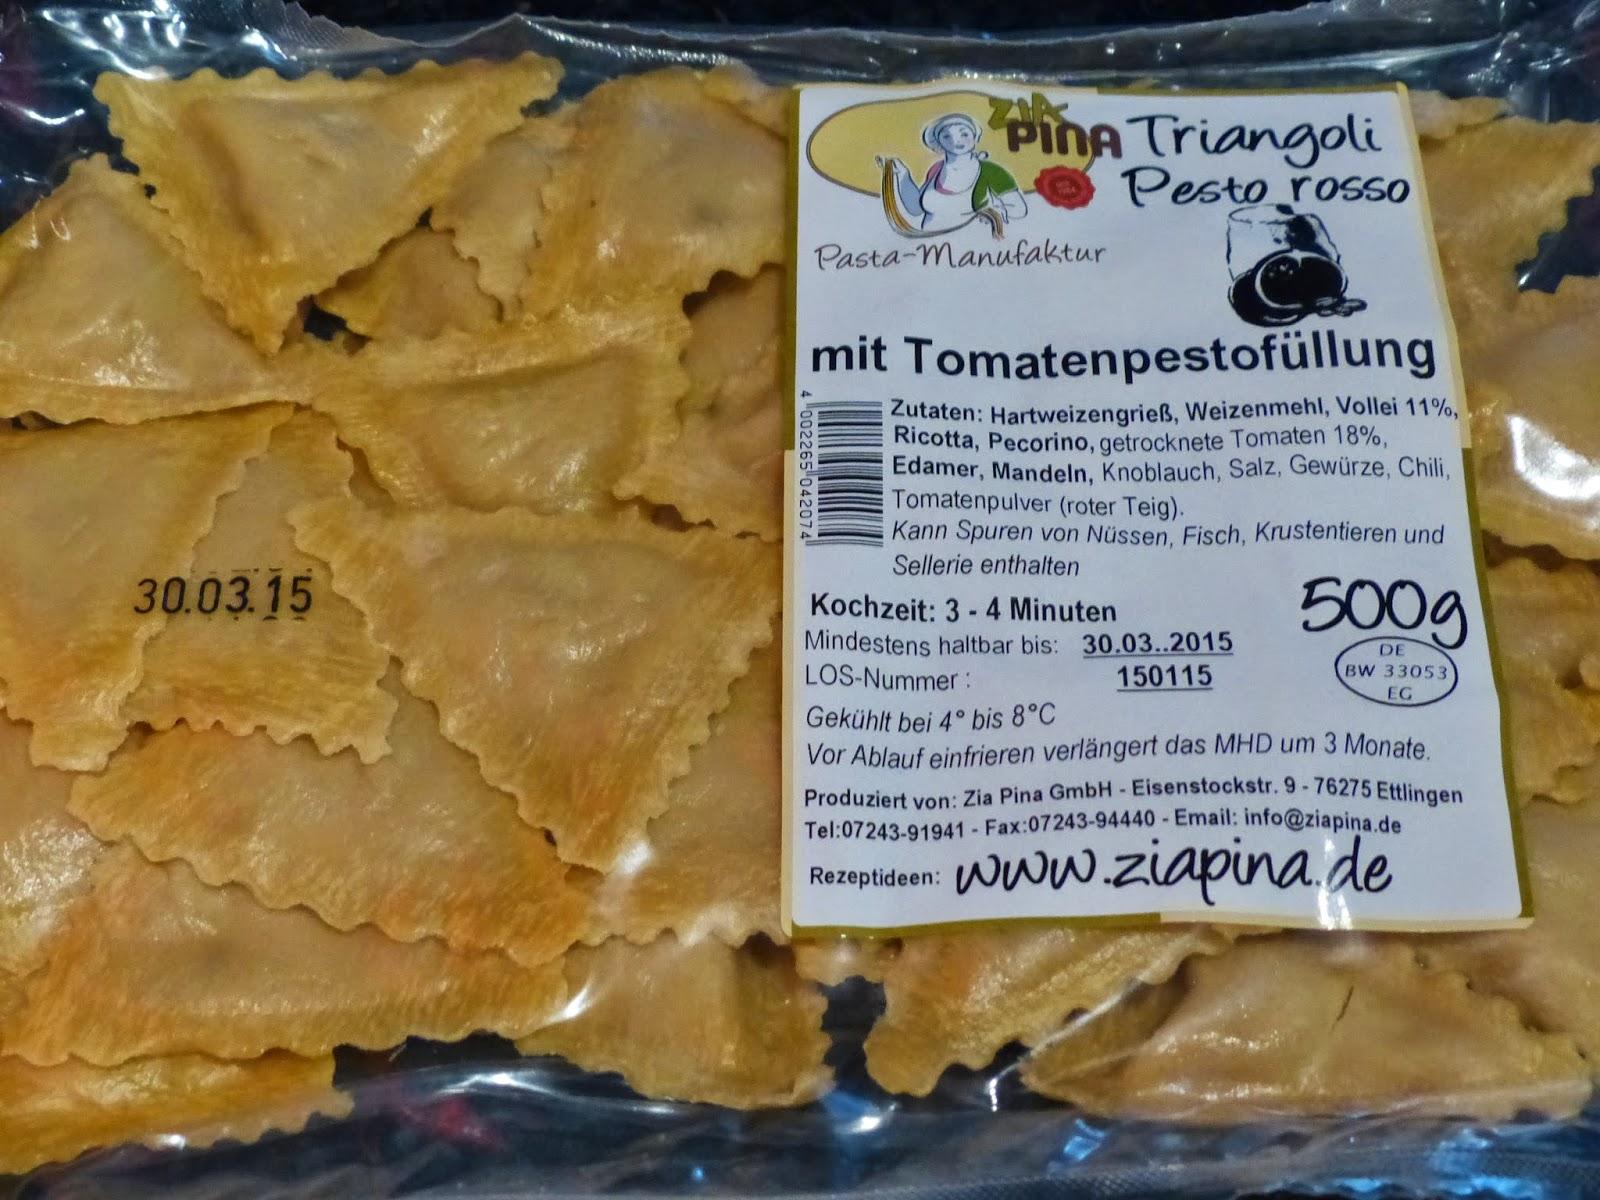 http://www.ziapina.de/index.php/sortiment/item/triangoli-mit-tomatenpesto